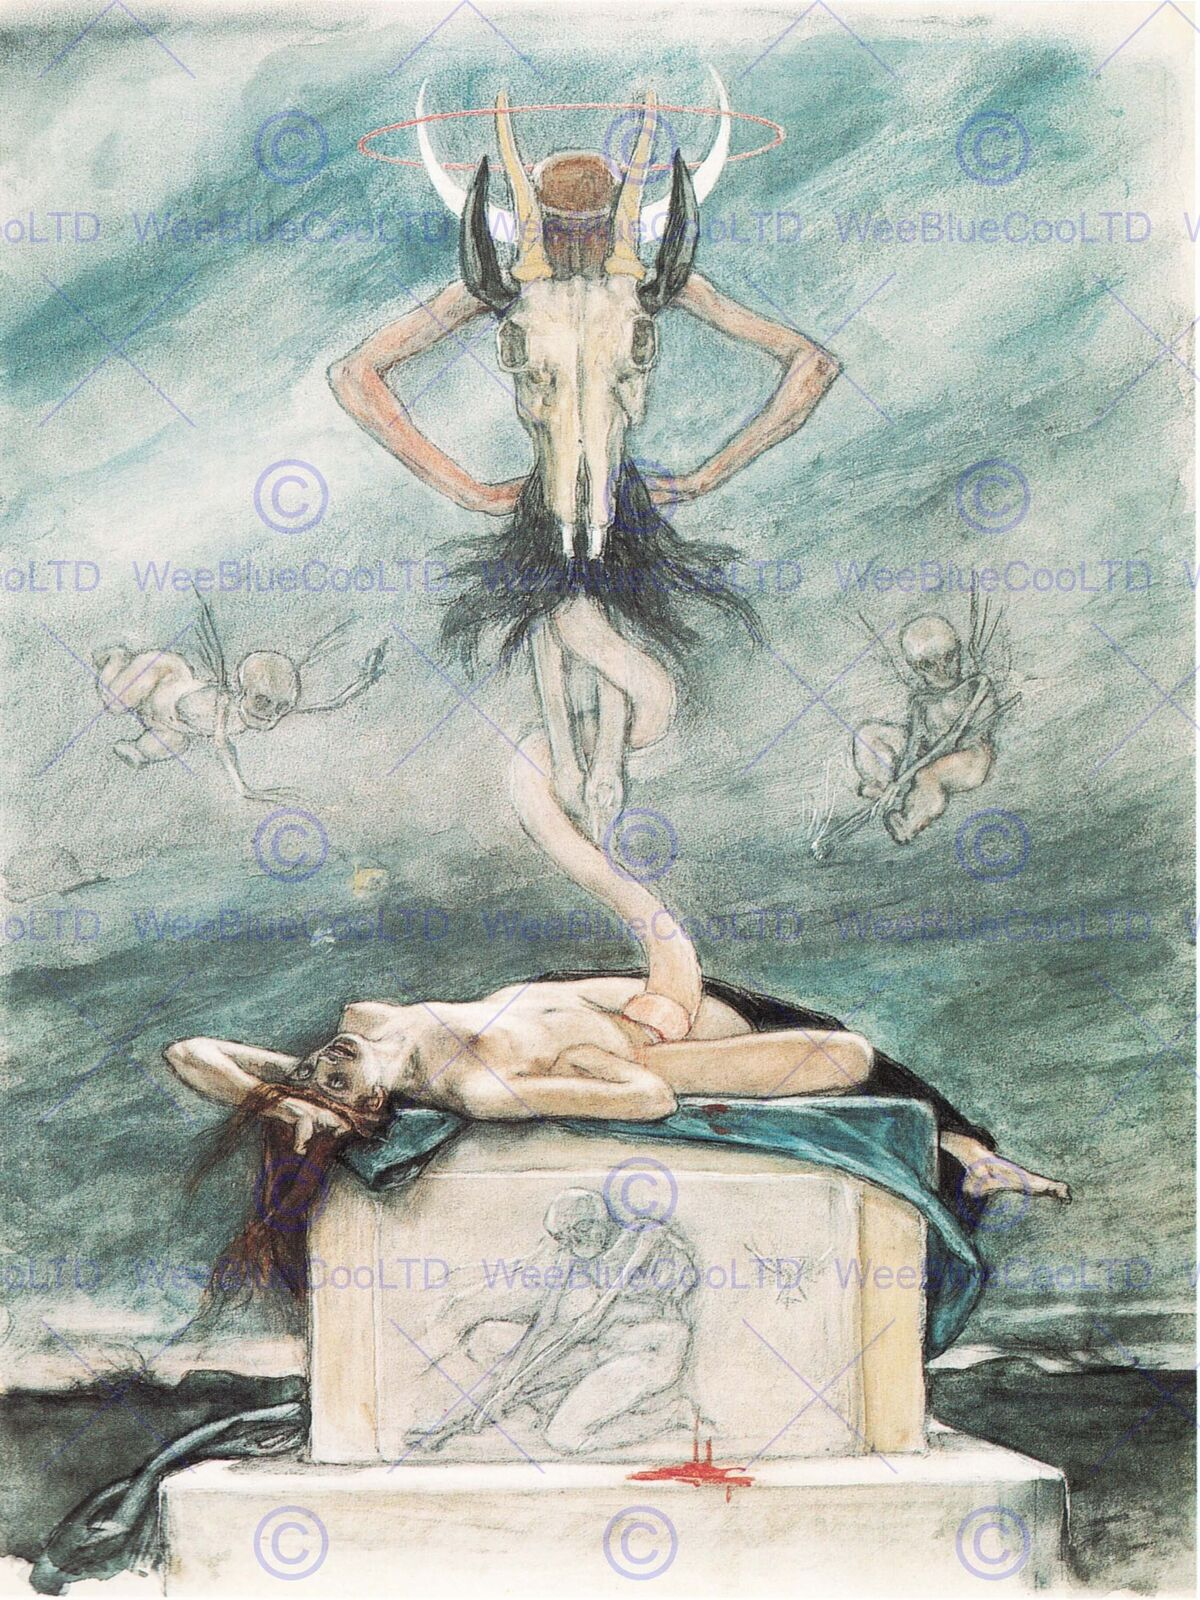 PAINTING PAINTING EDVARD  MUNCH VAMPIRE 1895 12X16 INCH ART PRINT POSTER HP2316